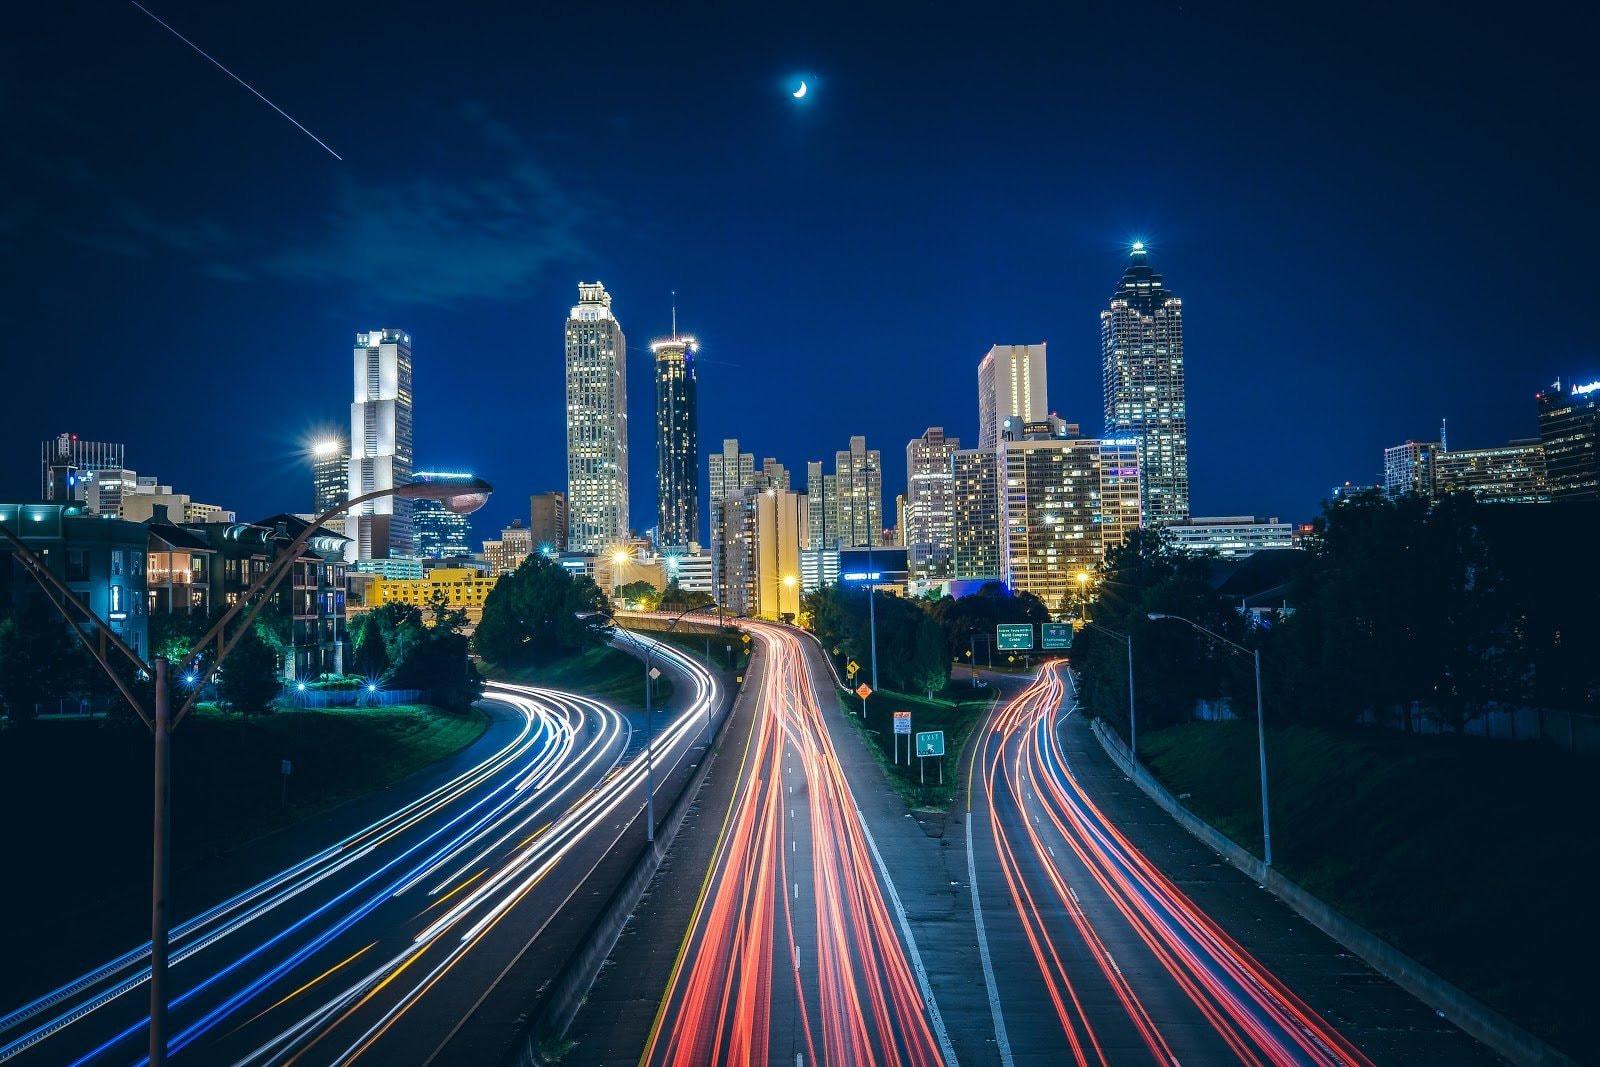 cityscape-photography-pana-vasquez